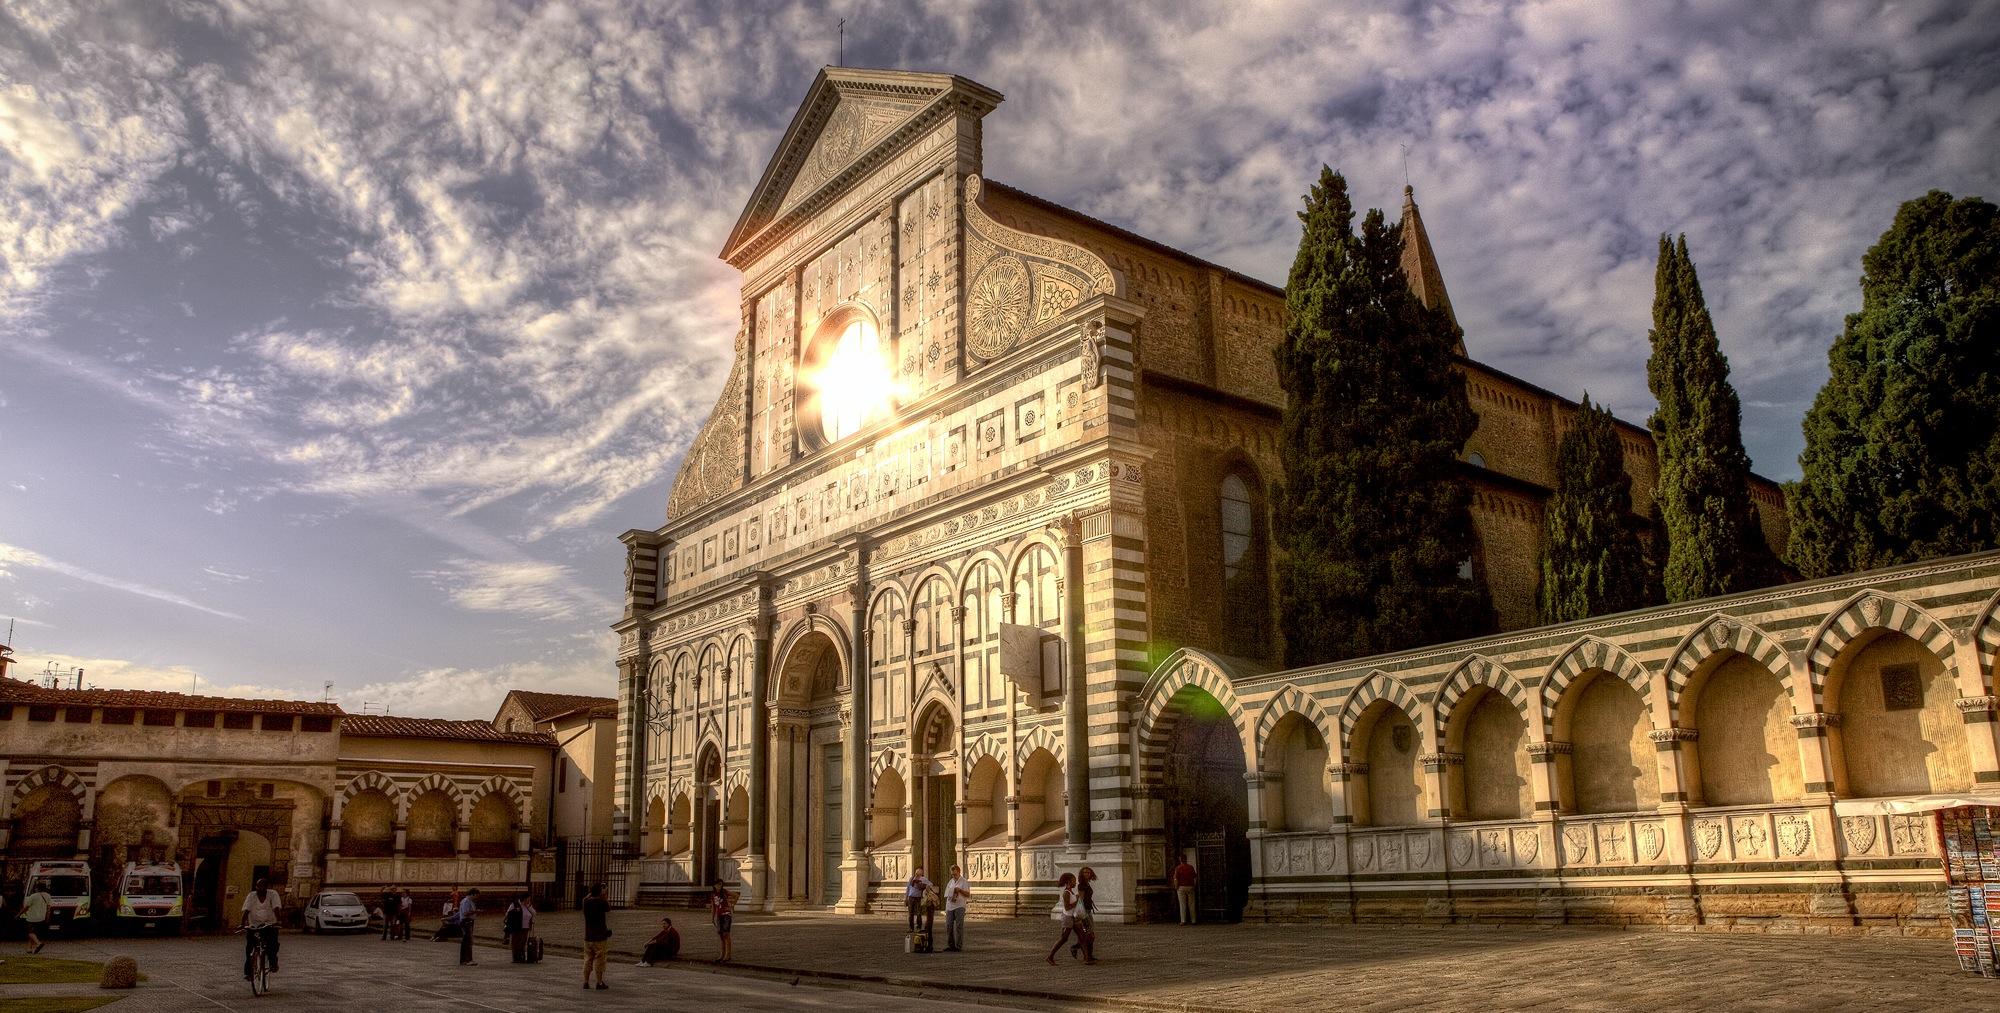 http://www.10cose.it/wp-content/uploads/2015/12/chiesa-santa-maria-novella-firenze.jpg